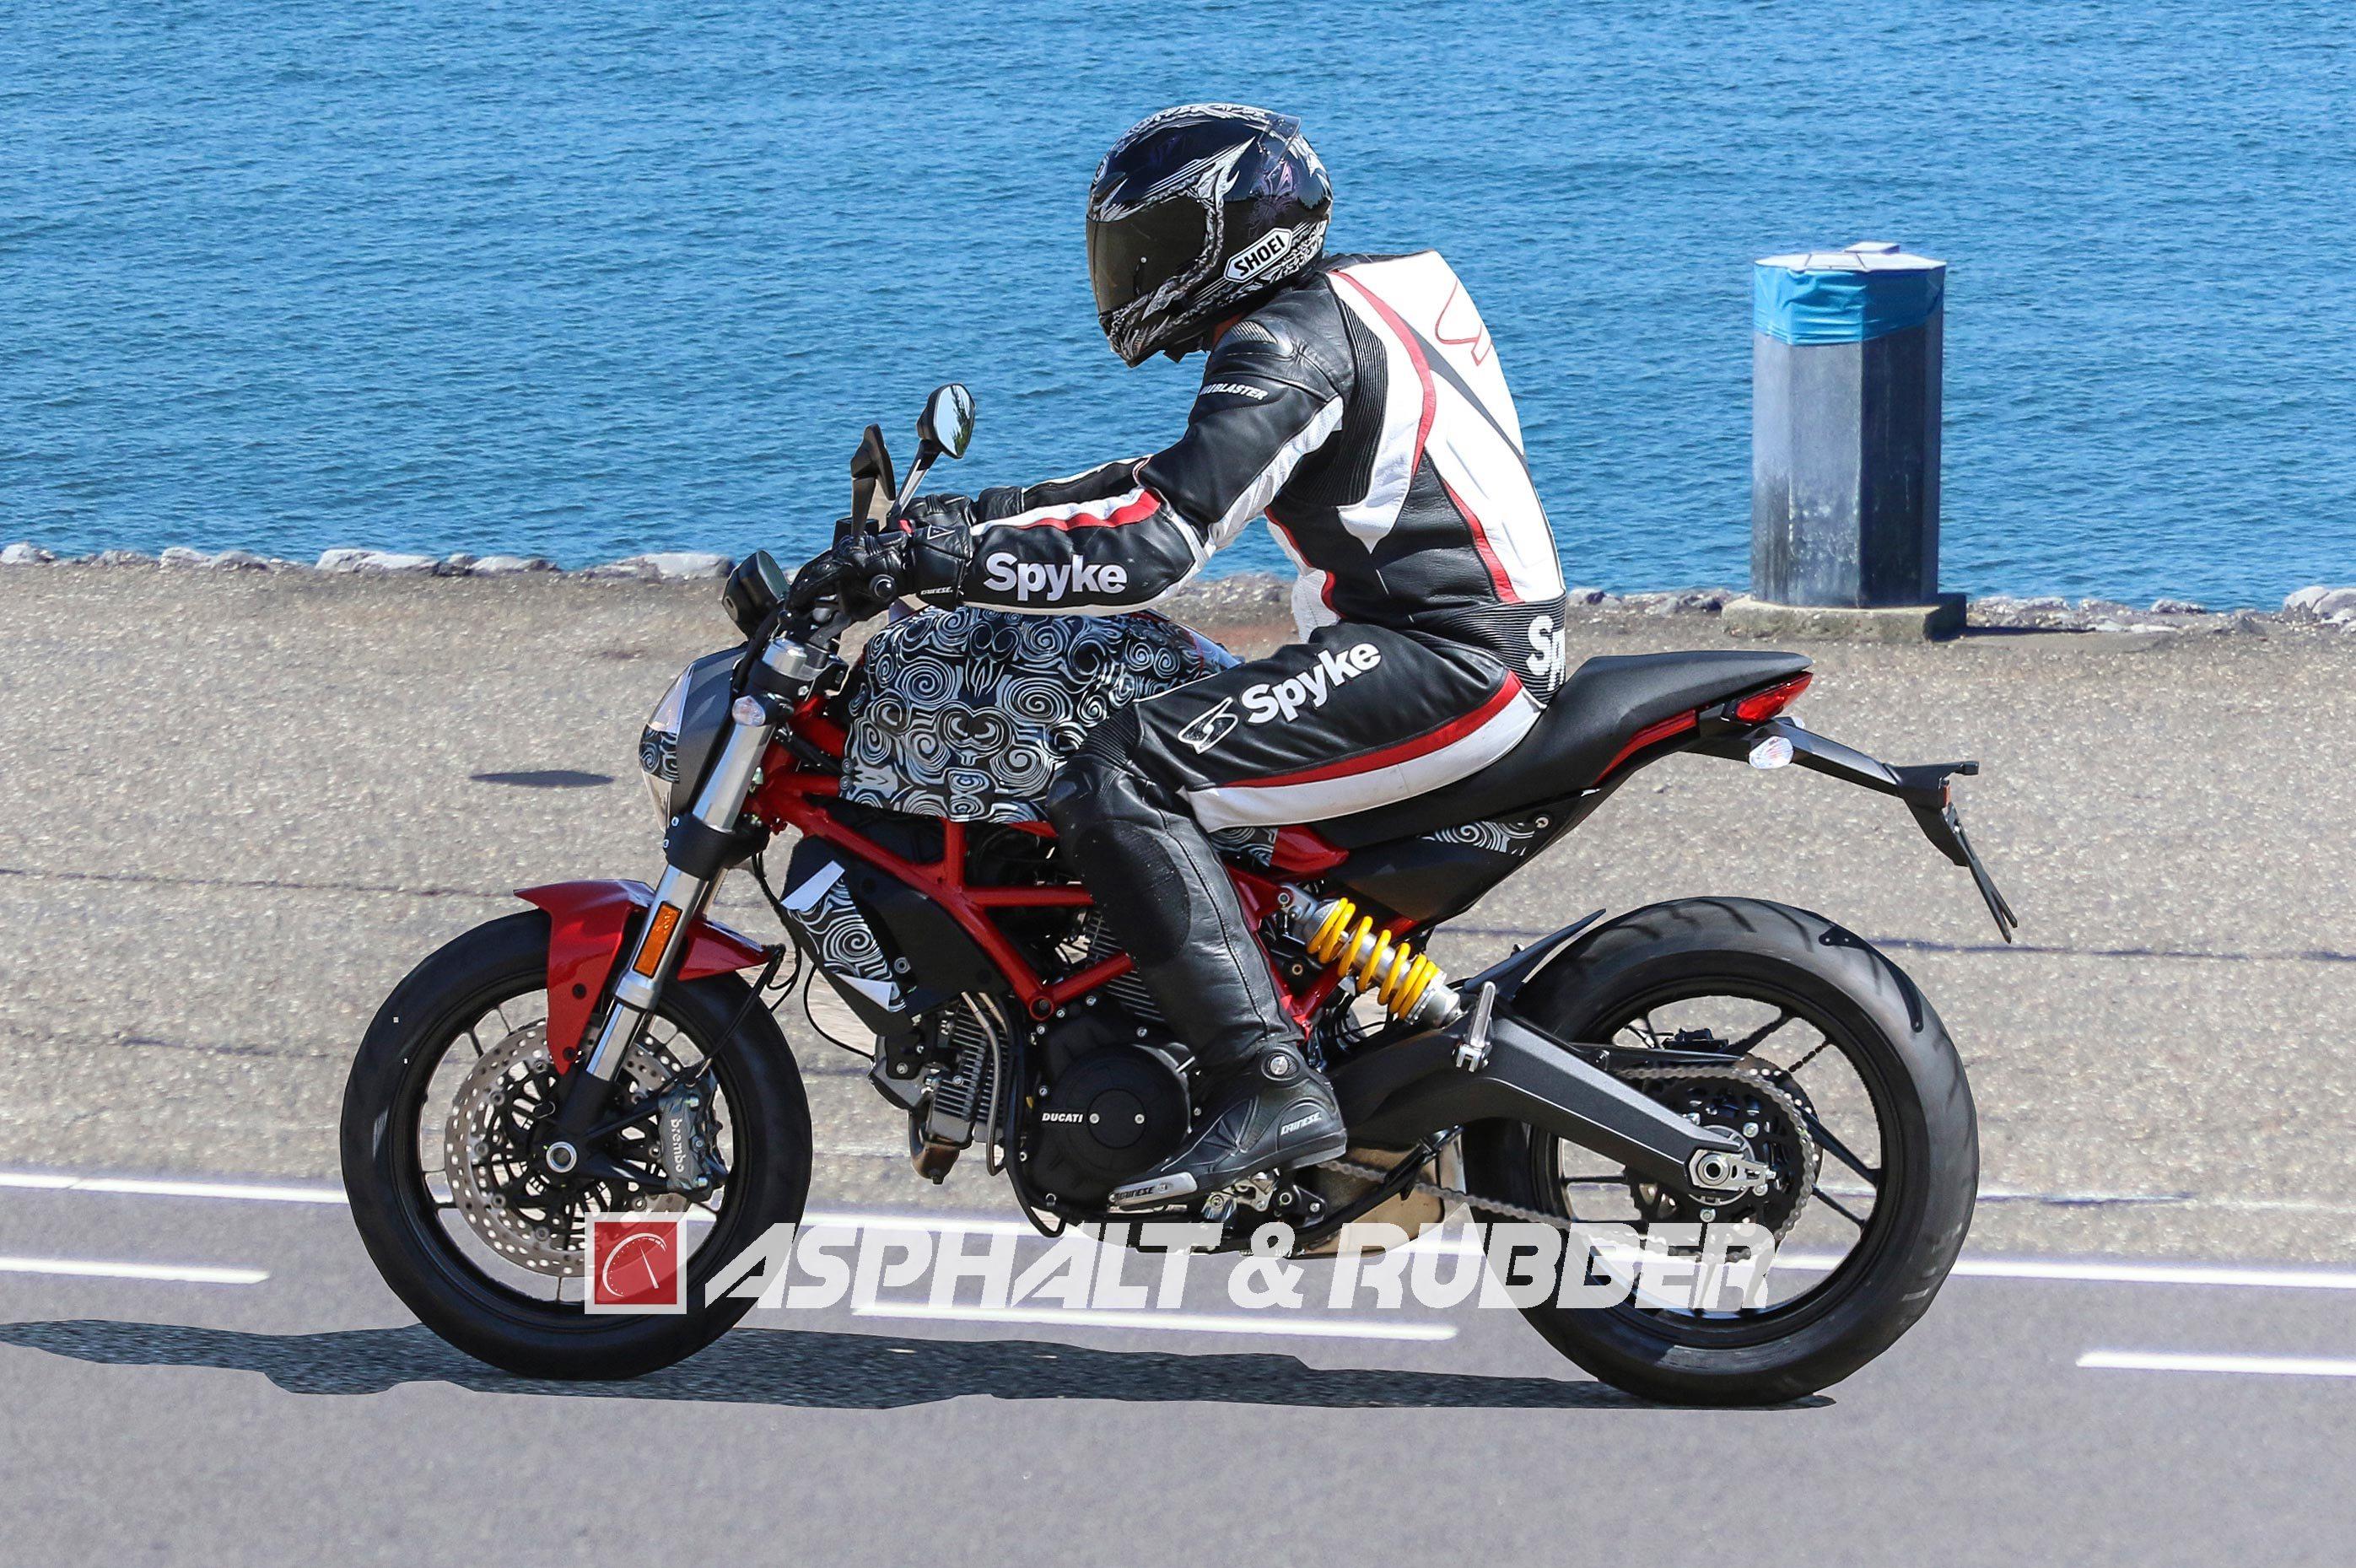 20160826_2017-Ducati-Monster-803-air-cooled.jpg